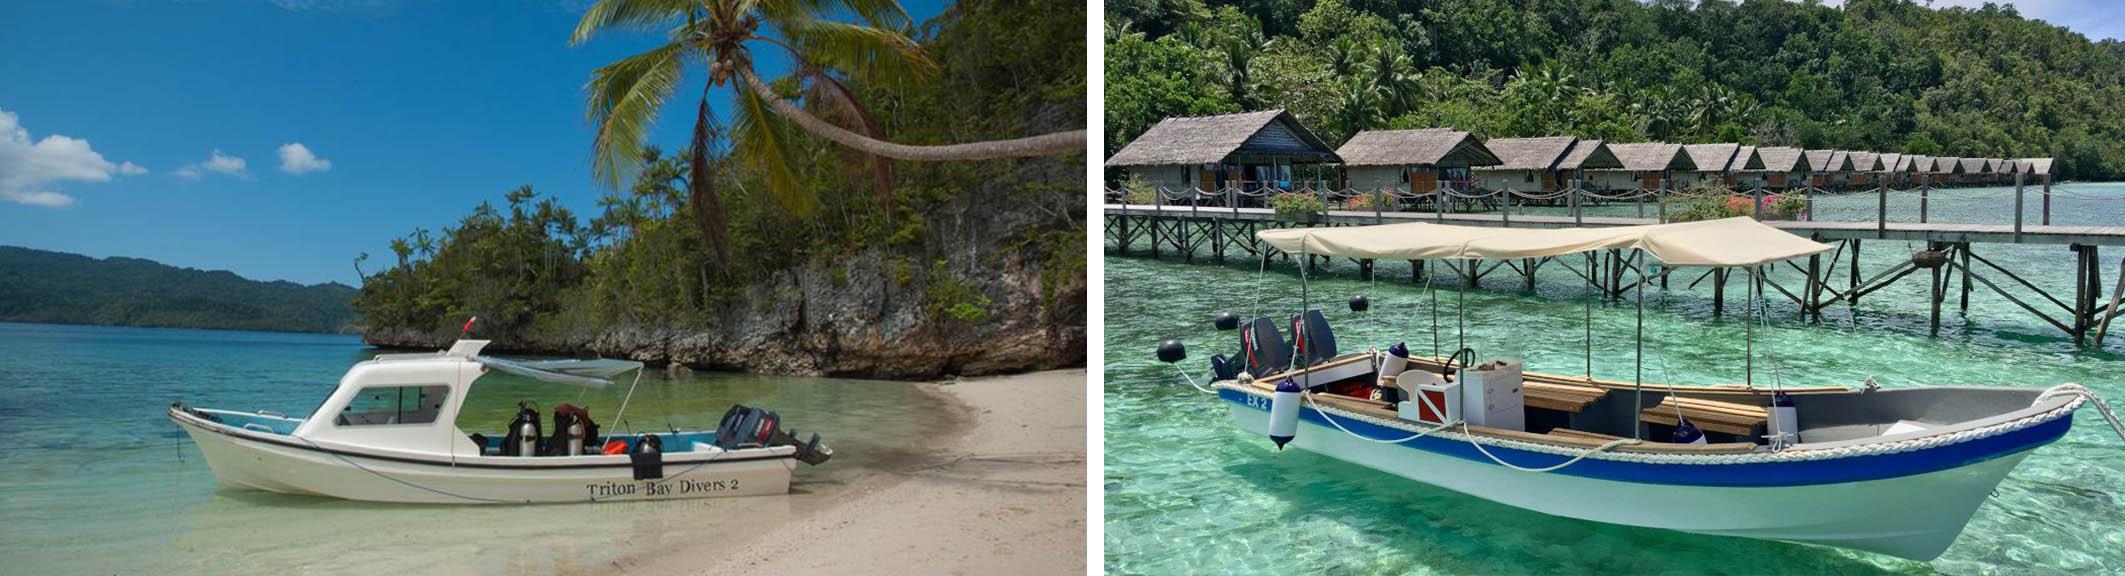 Triton Bay and papua Explorers snorkel boats